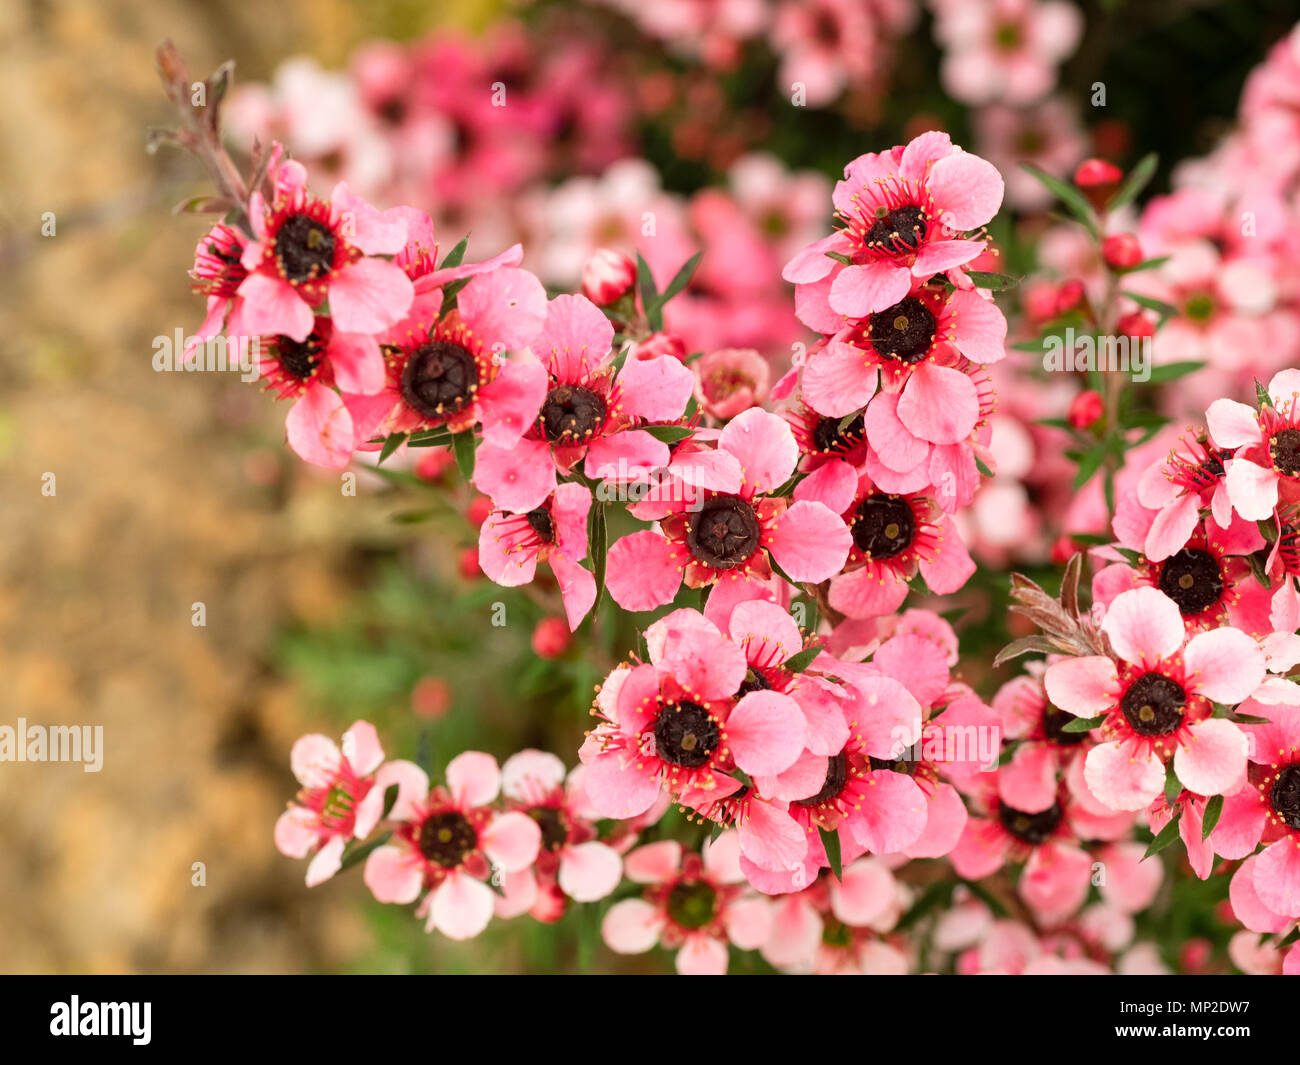 Rosa blühenden Form der Neuseeland Manuka oder Teebaum, Leptospermum scoparium 'Martini', Hardy in milderen Klimazonen Stockbild